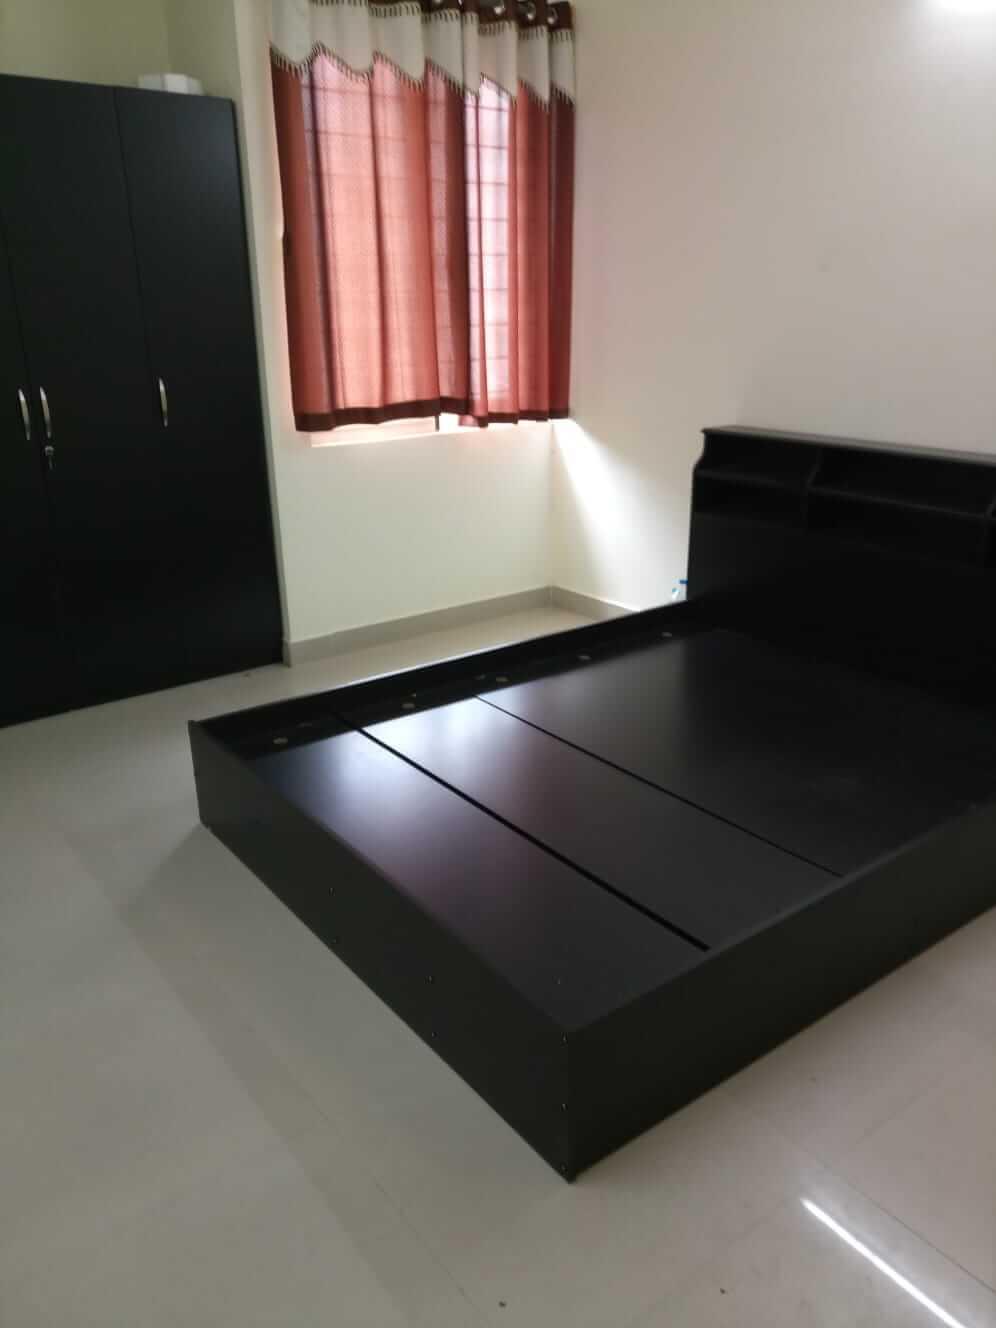 3 BHK Apartment / Flat for Rent 950 Sq. Feet at Bangalore, Anekal